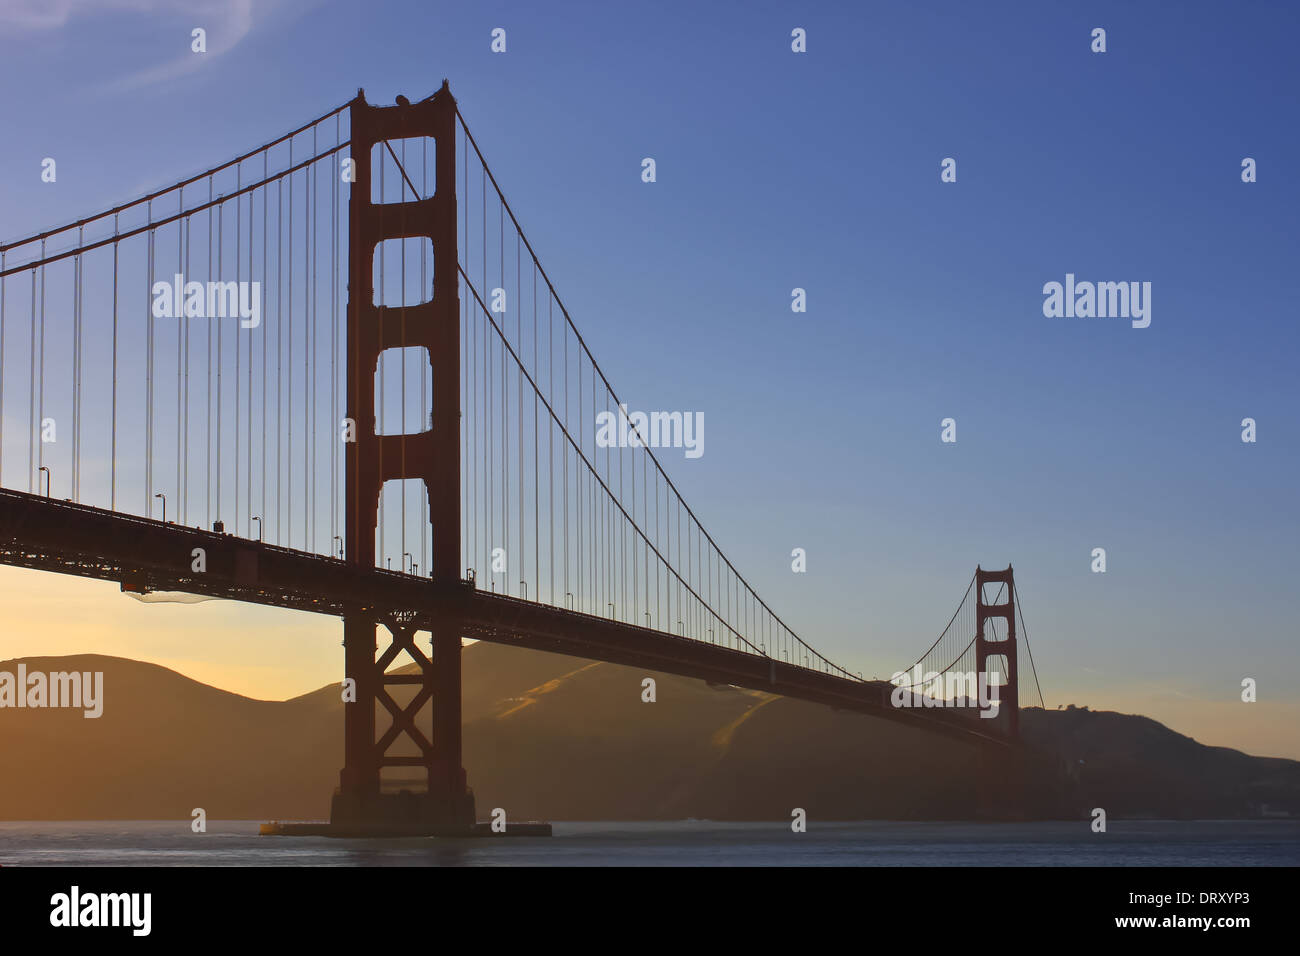 Golden Gate Bridge am Abend - Stock Image